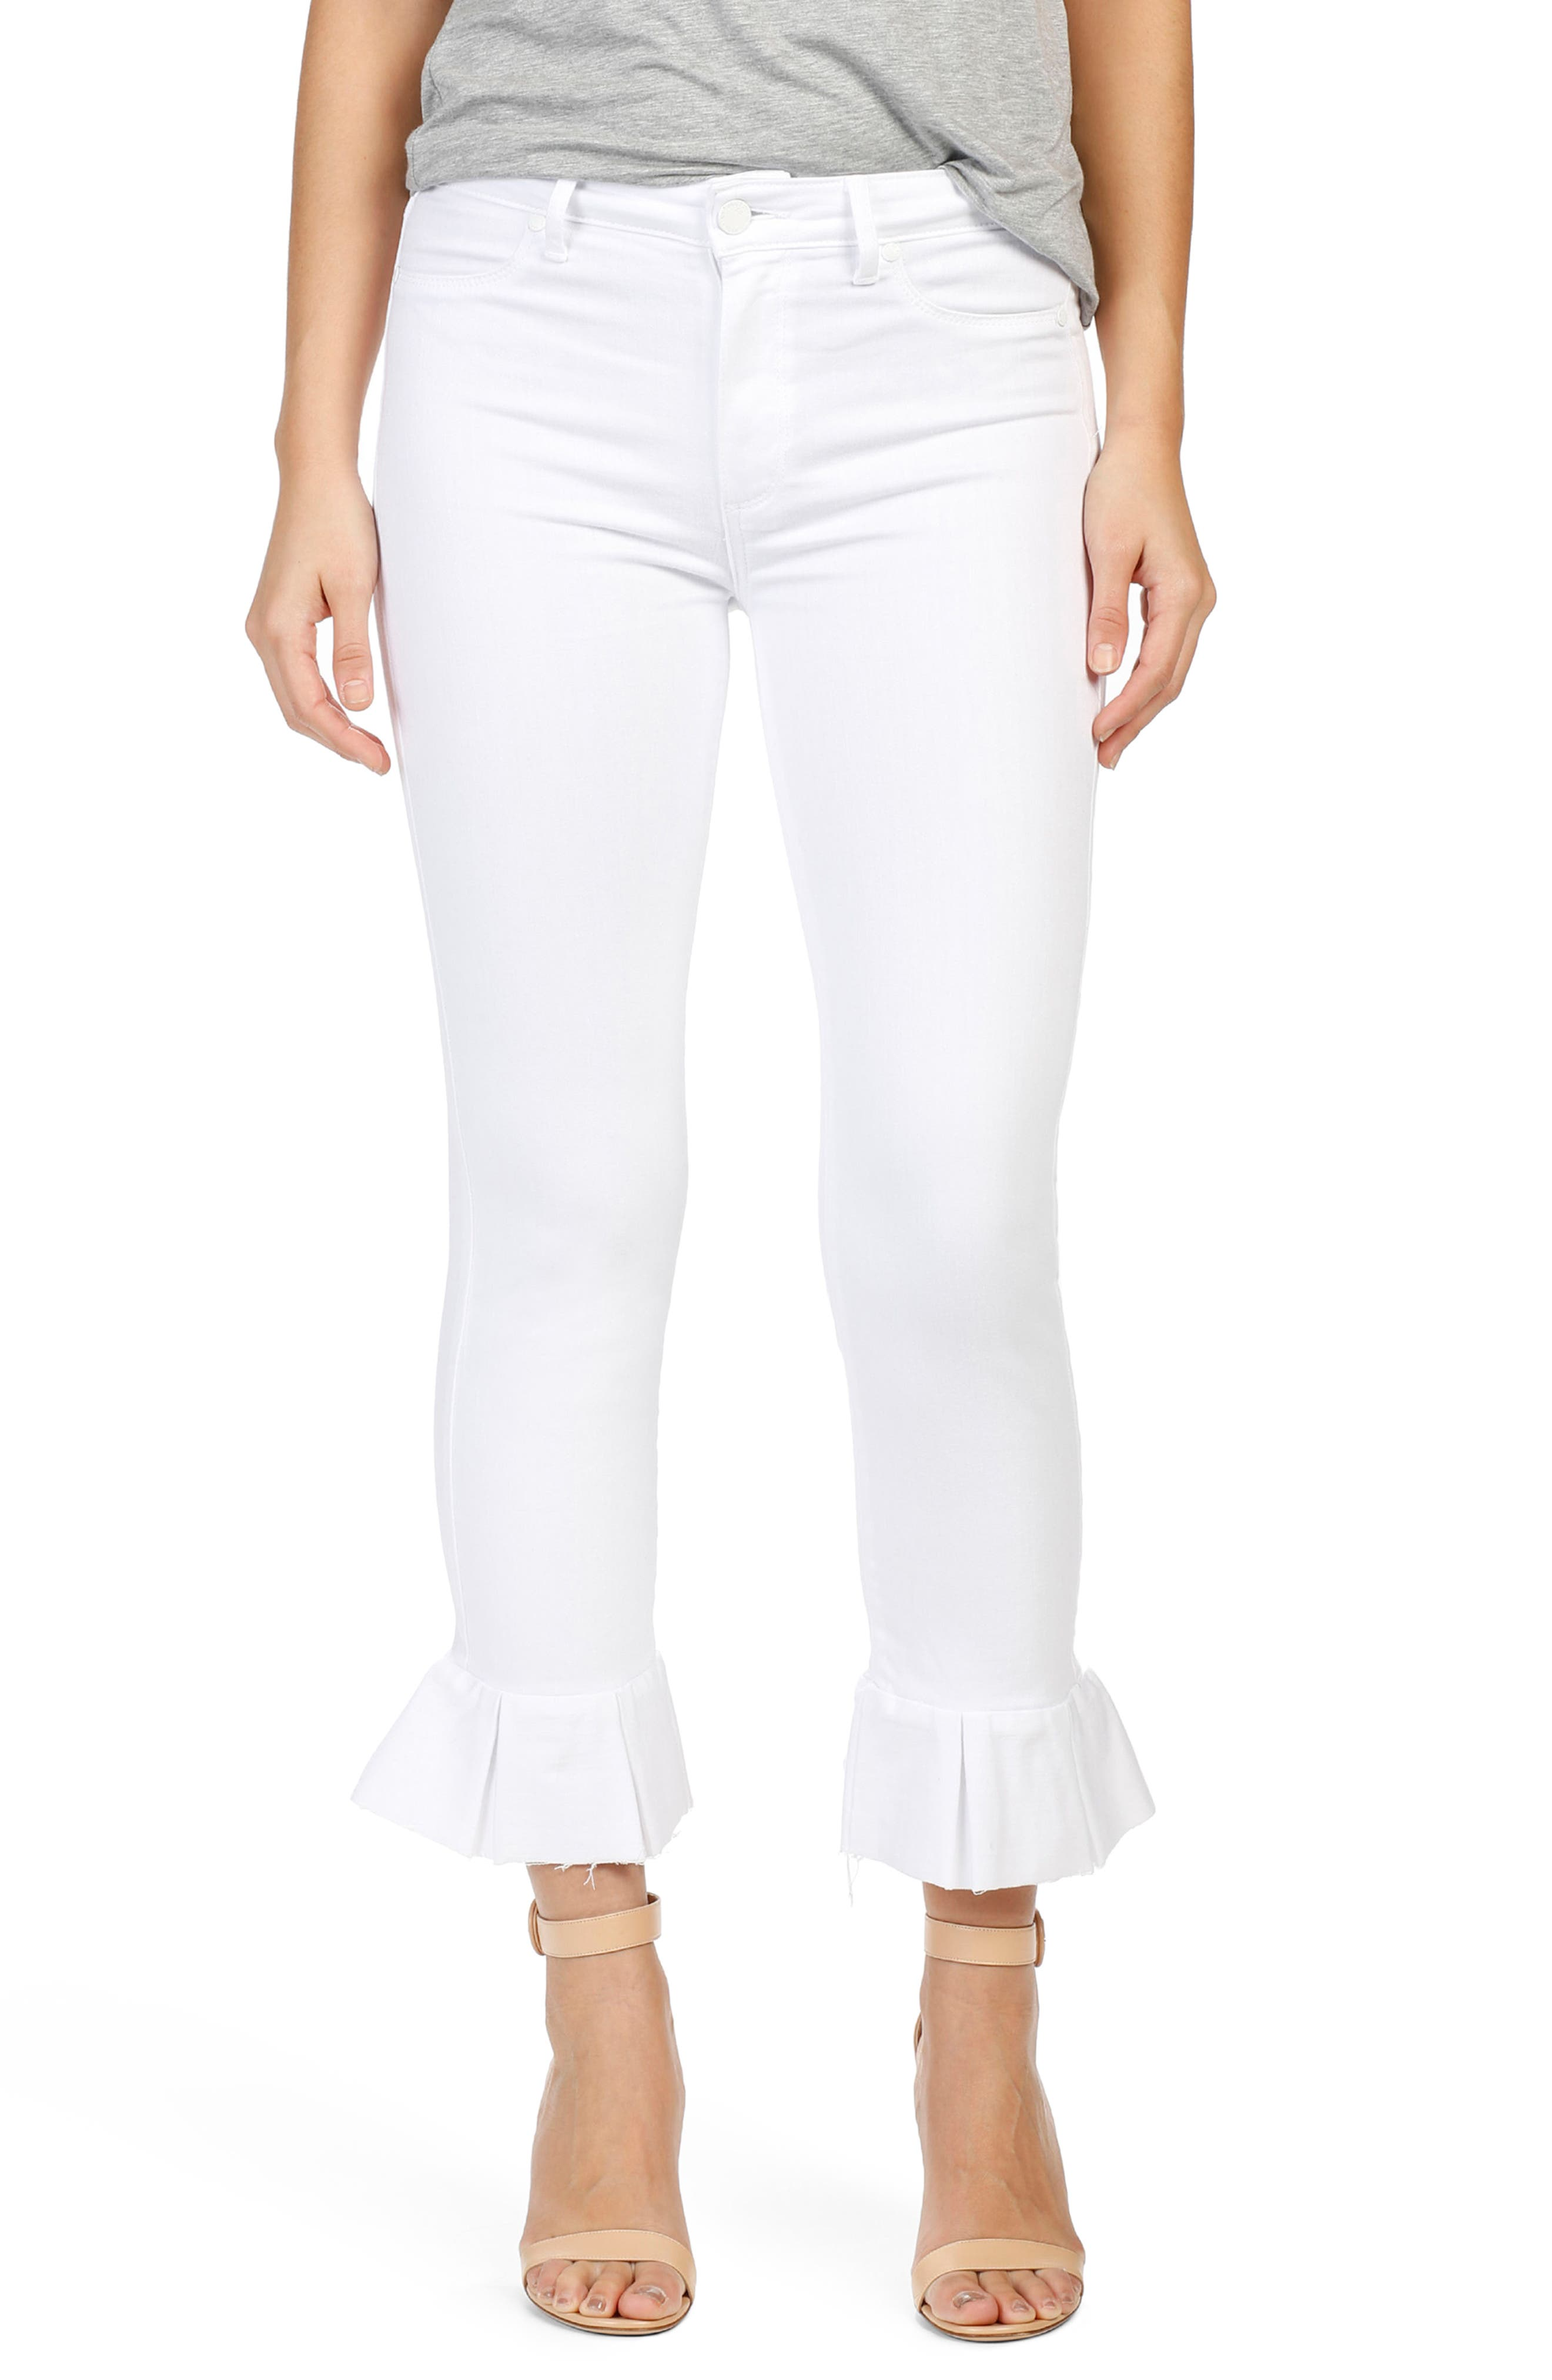 Alternate Image 1 Selected - PAIGE Rafaela High Waist Raw Hem Ankle Ultra Skinny Jeans (Optic White)